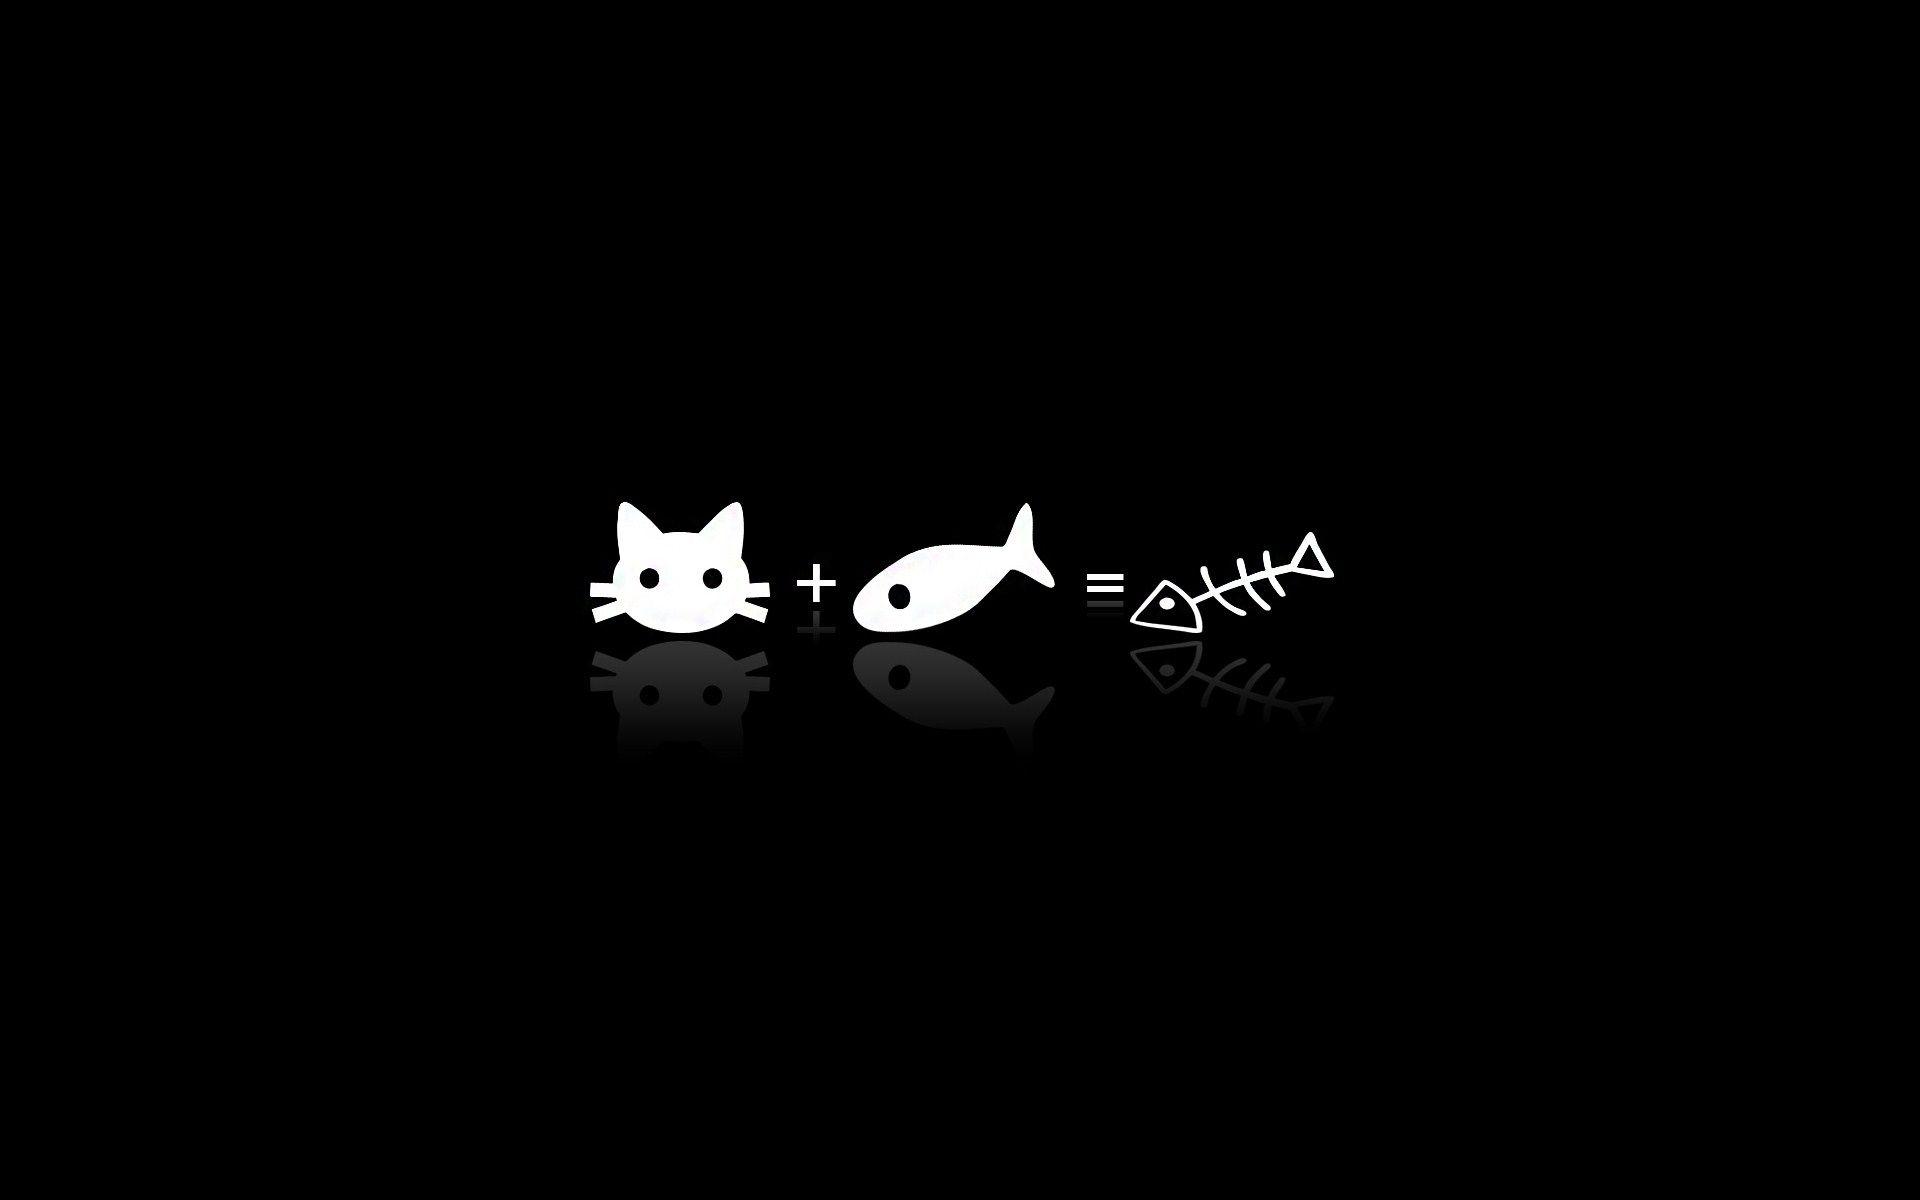 Vector Cat Fish Cute Black Wallpaper Aesthetic Tumblr Backgrounds Desktop Wallpaper Black